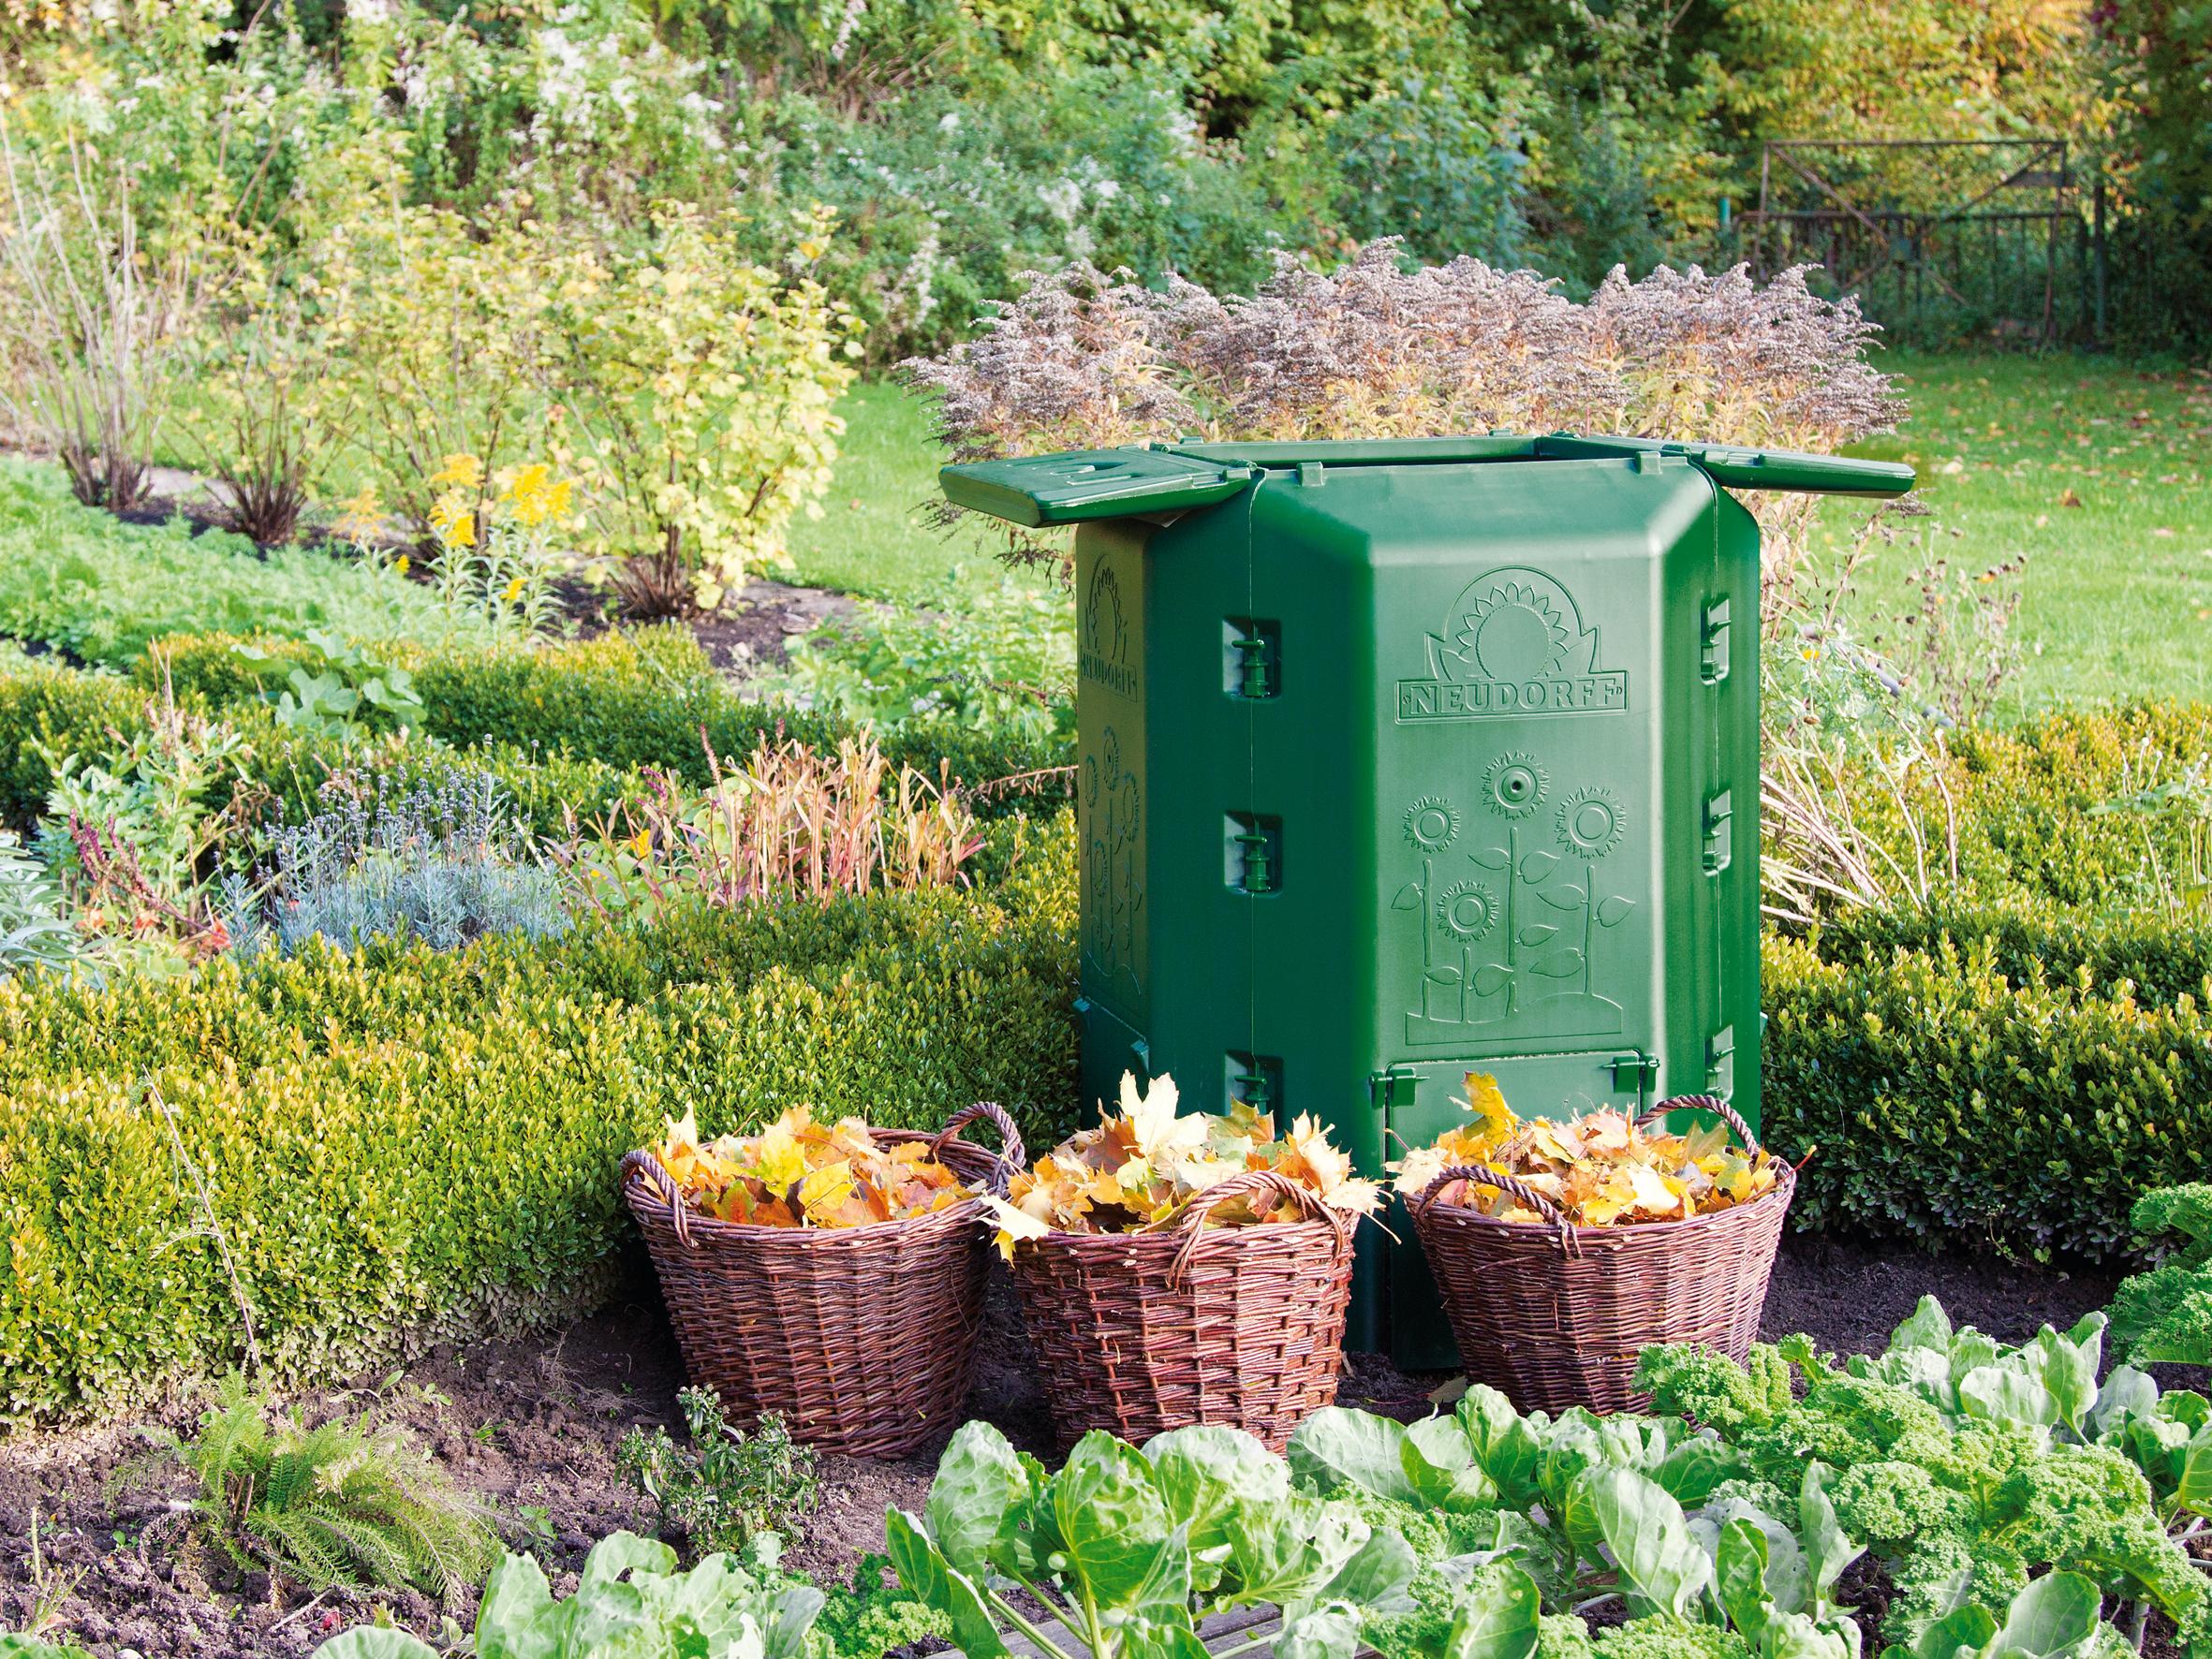 D coration compostage soins conseils jardin 12 avignon for Conseil deco jardin